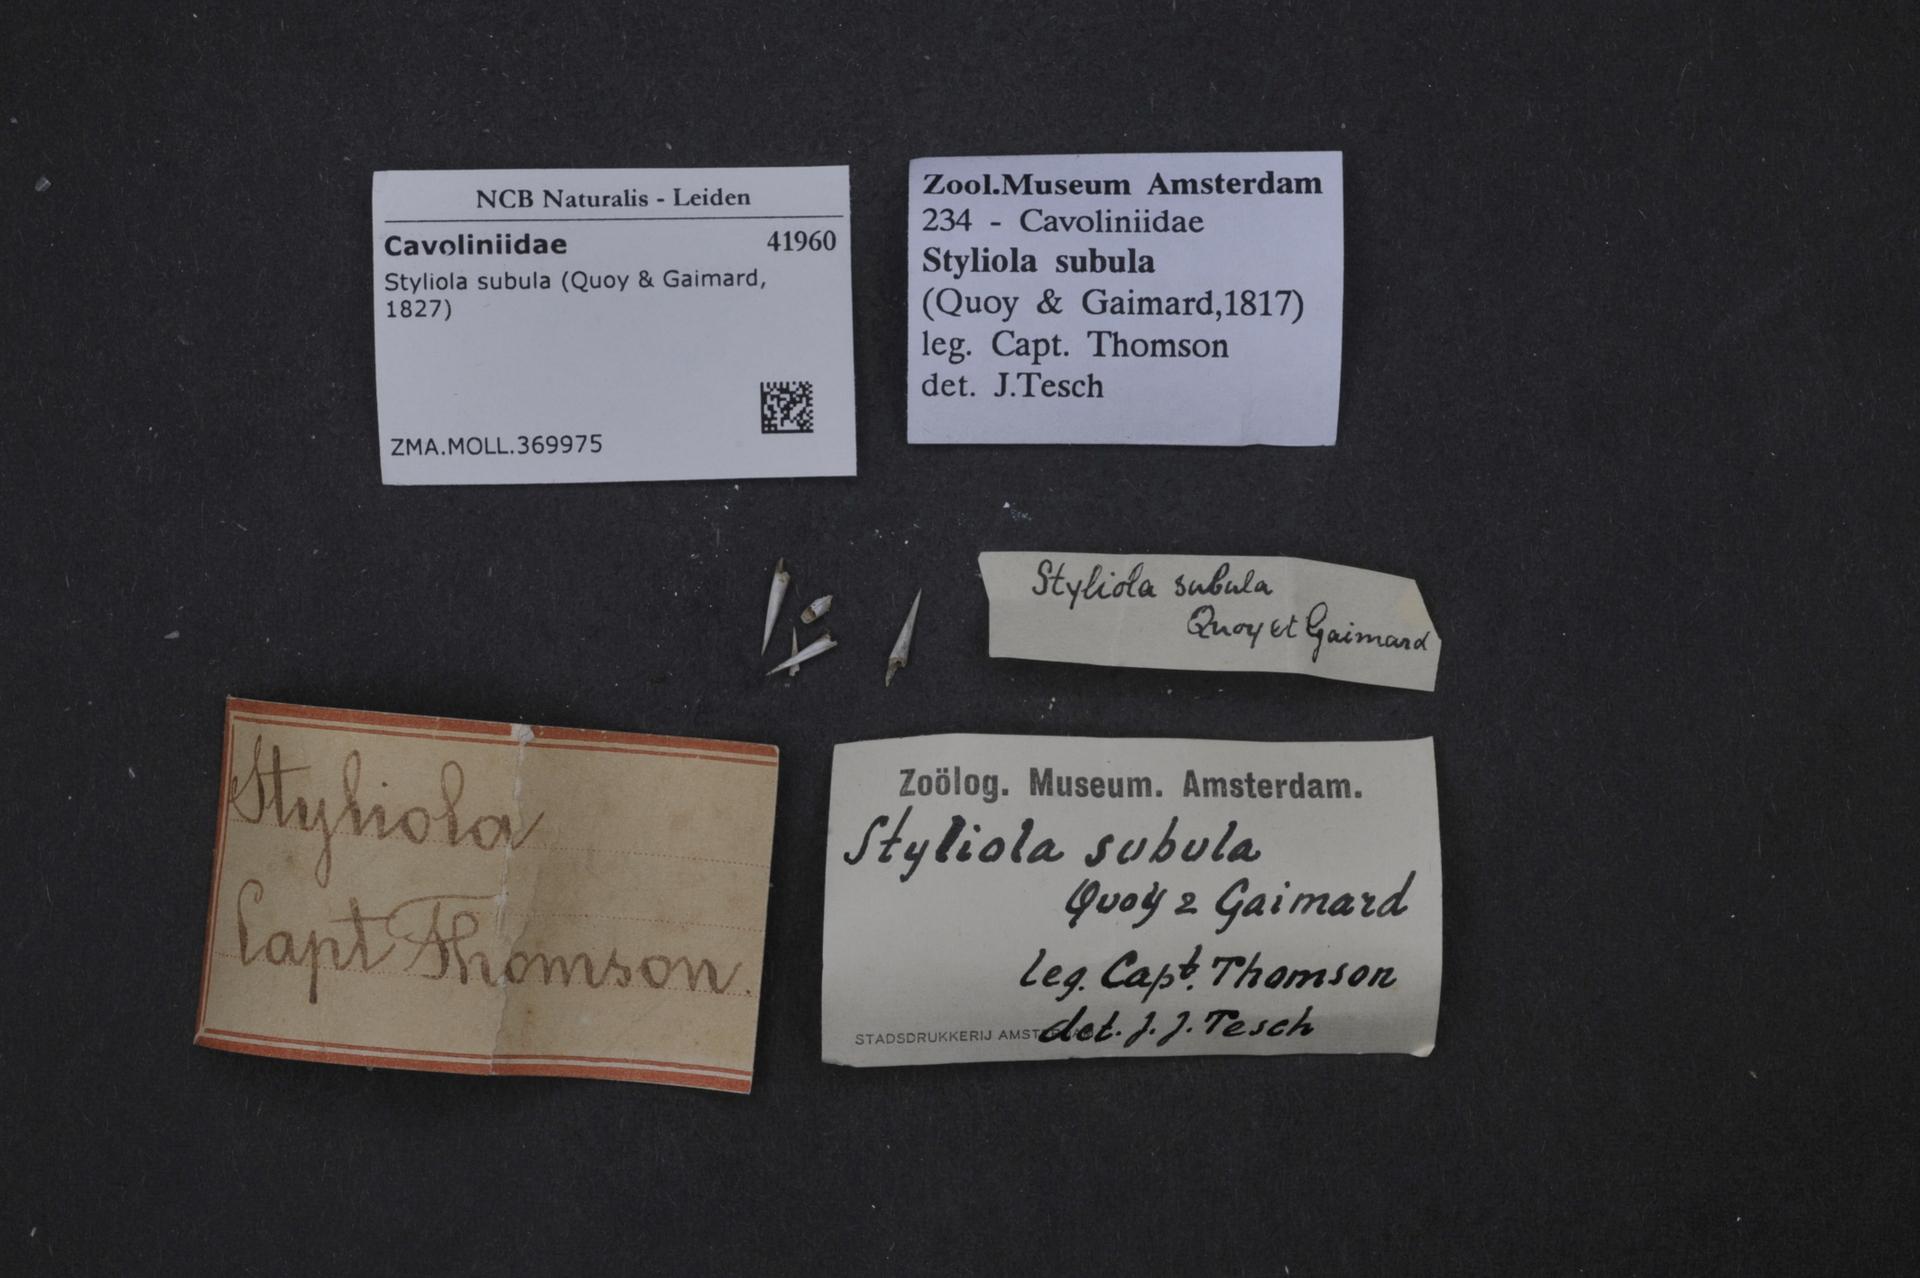 ZMA.MOLL.369975   Styliola subula (Quoy & Gaimard, 1827)